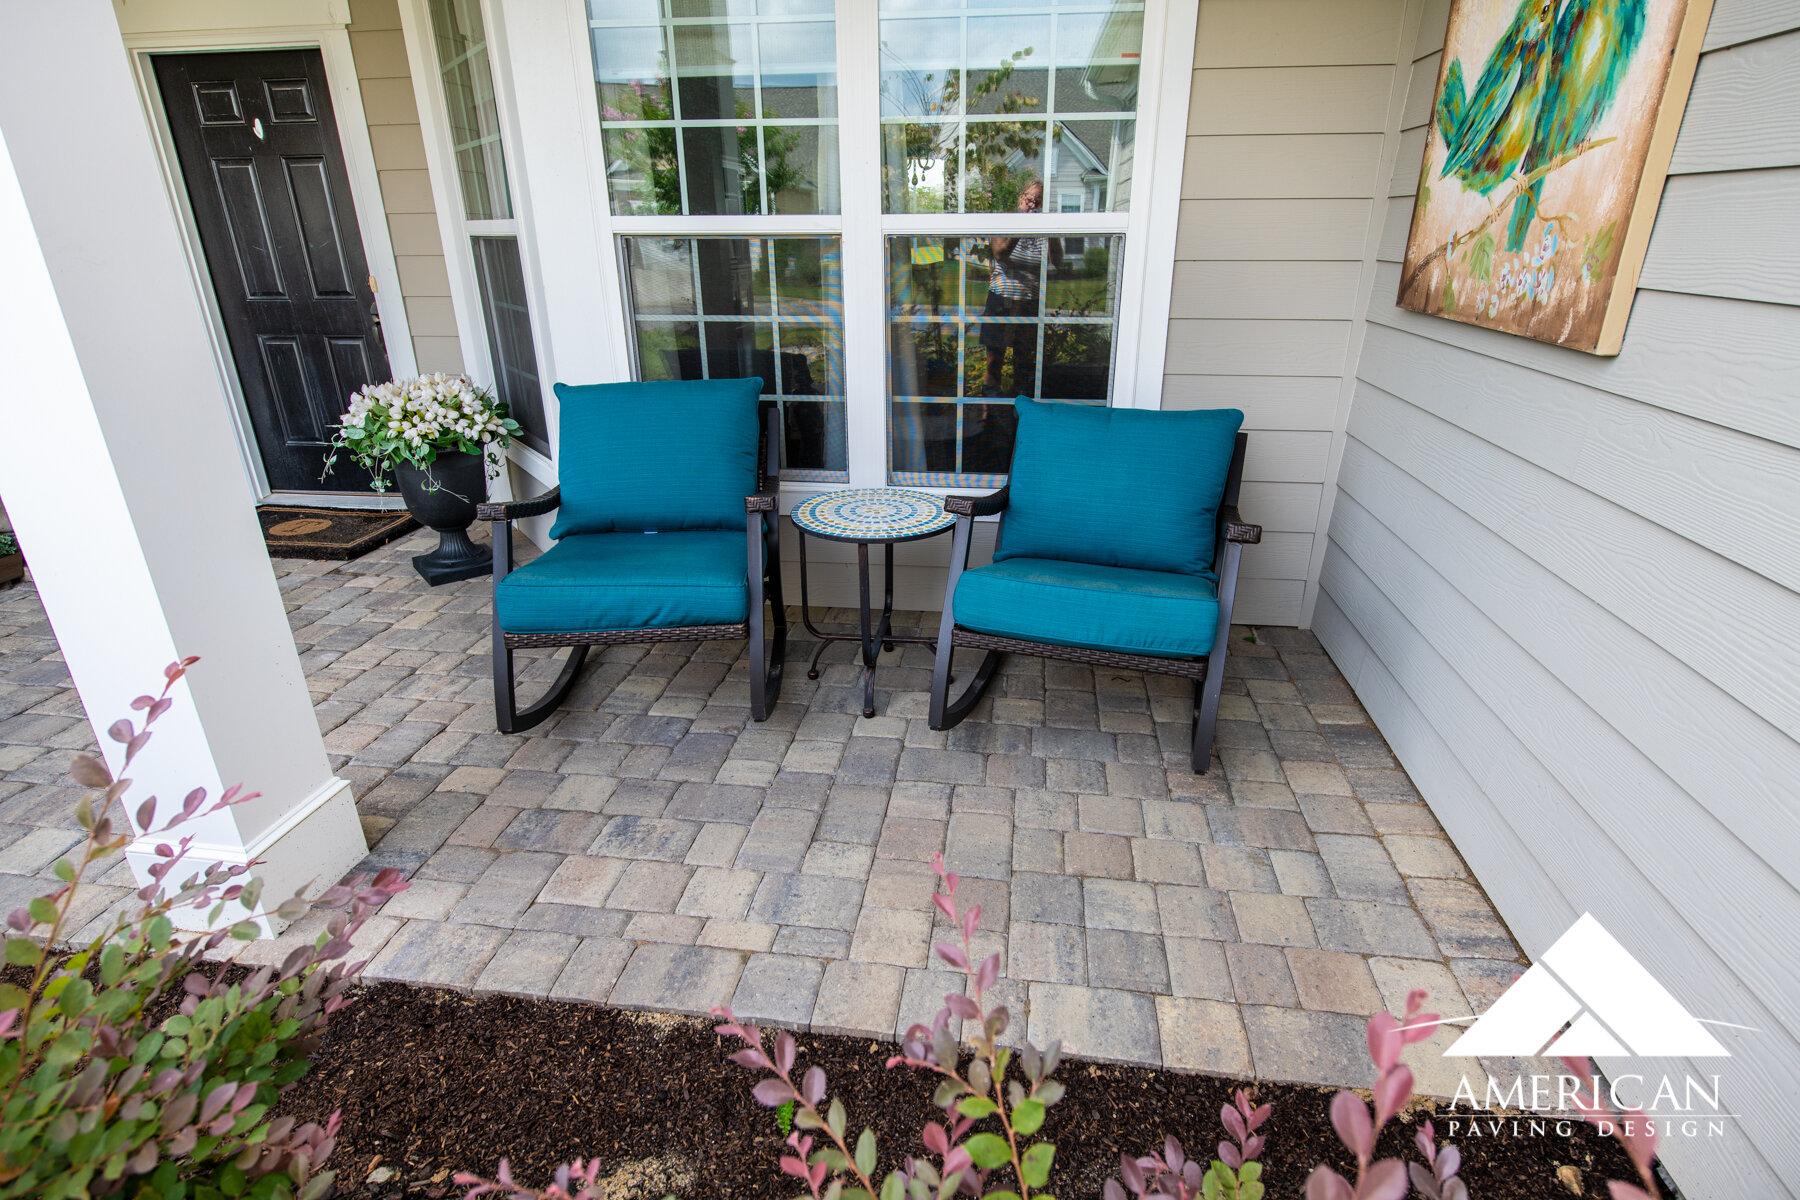 How Do I Pave My Backyard American Paving Design